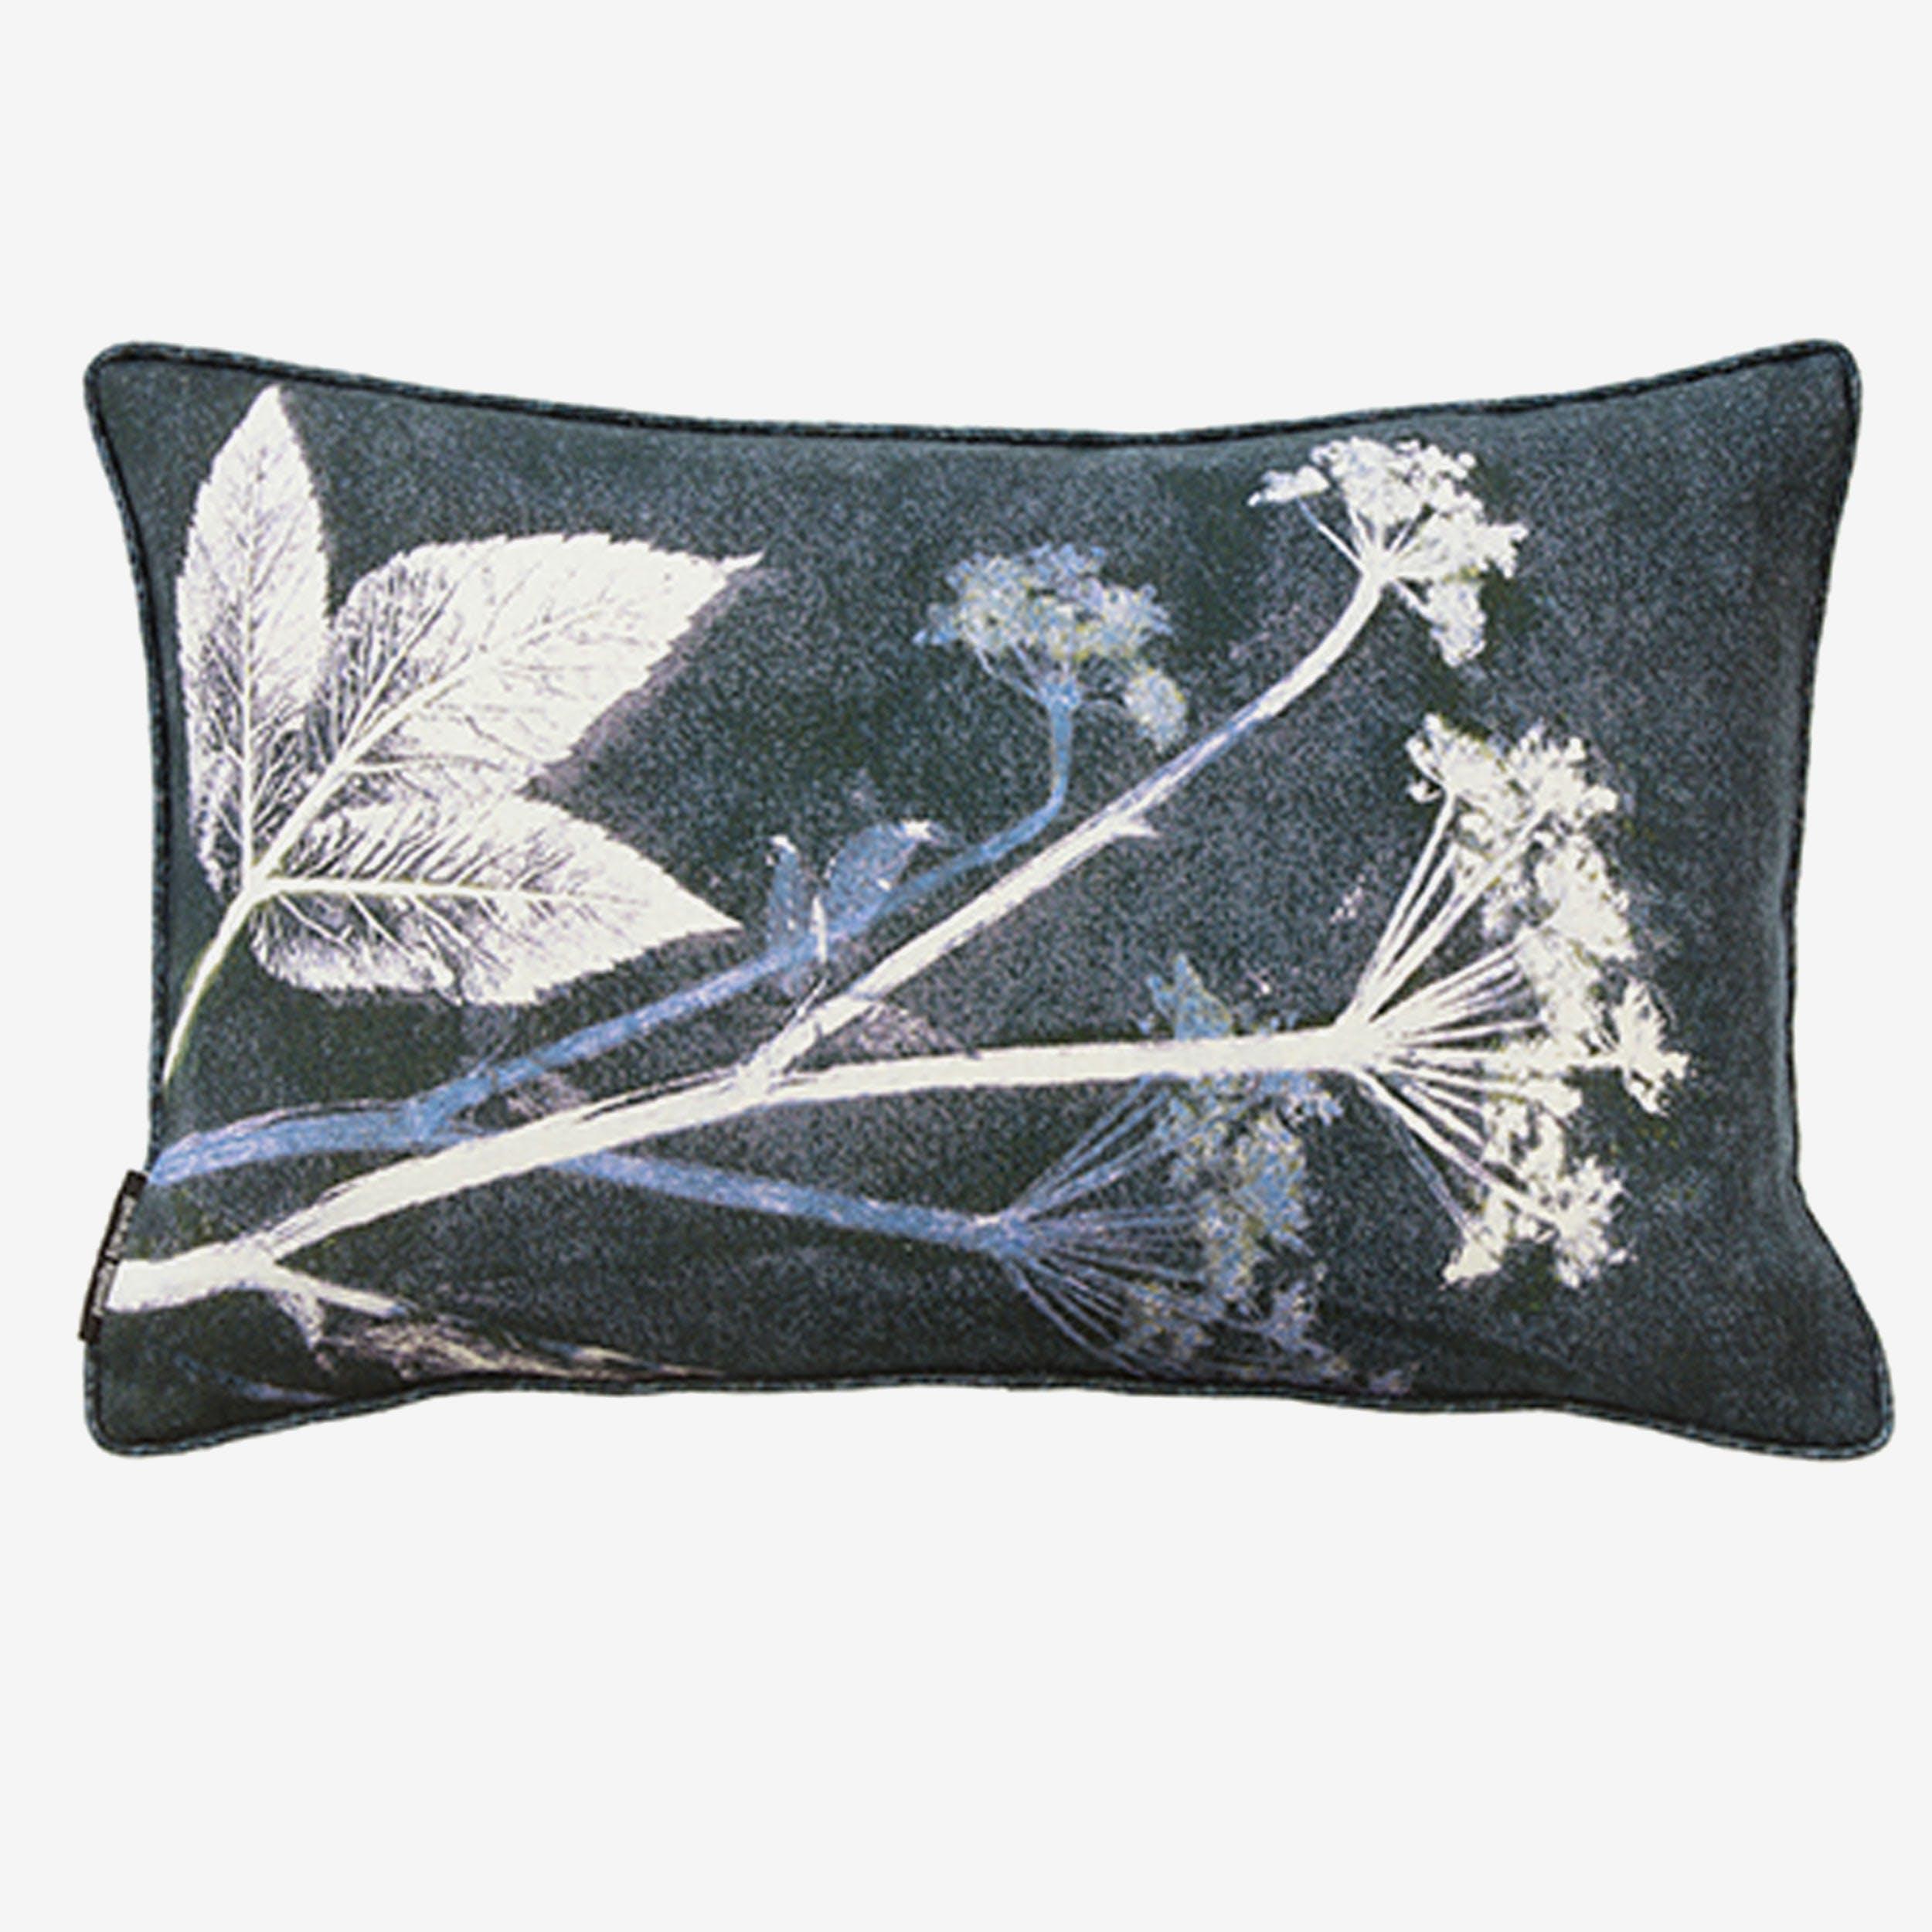 Groundelder Small Cushion